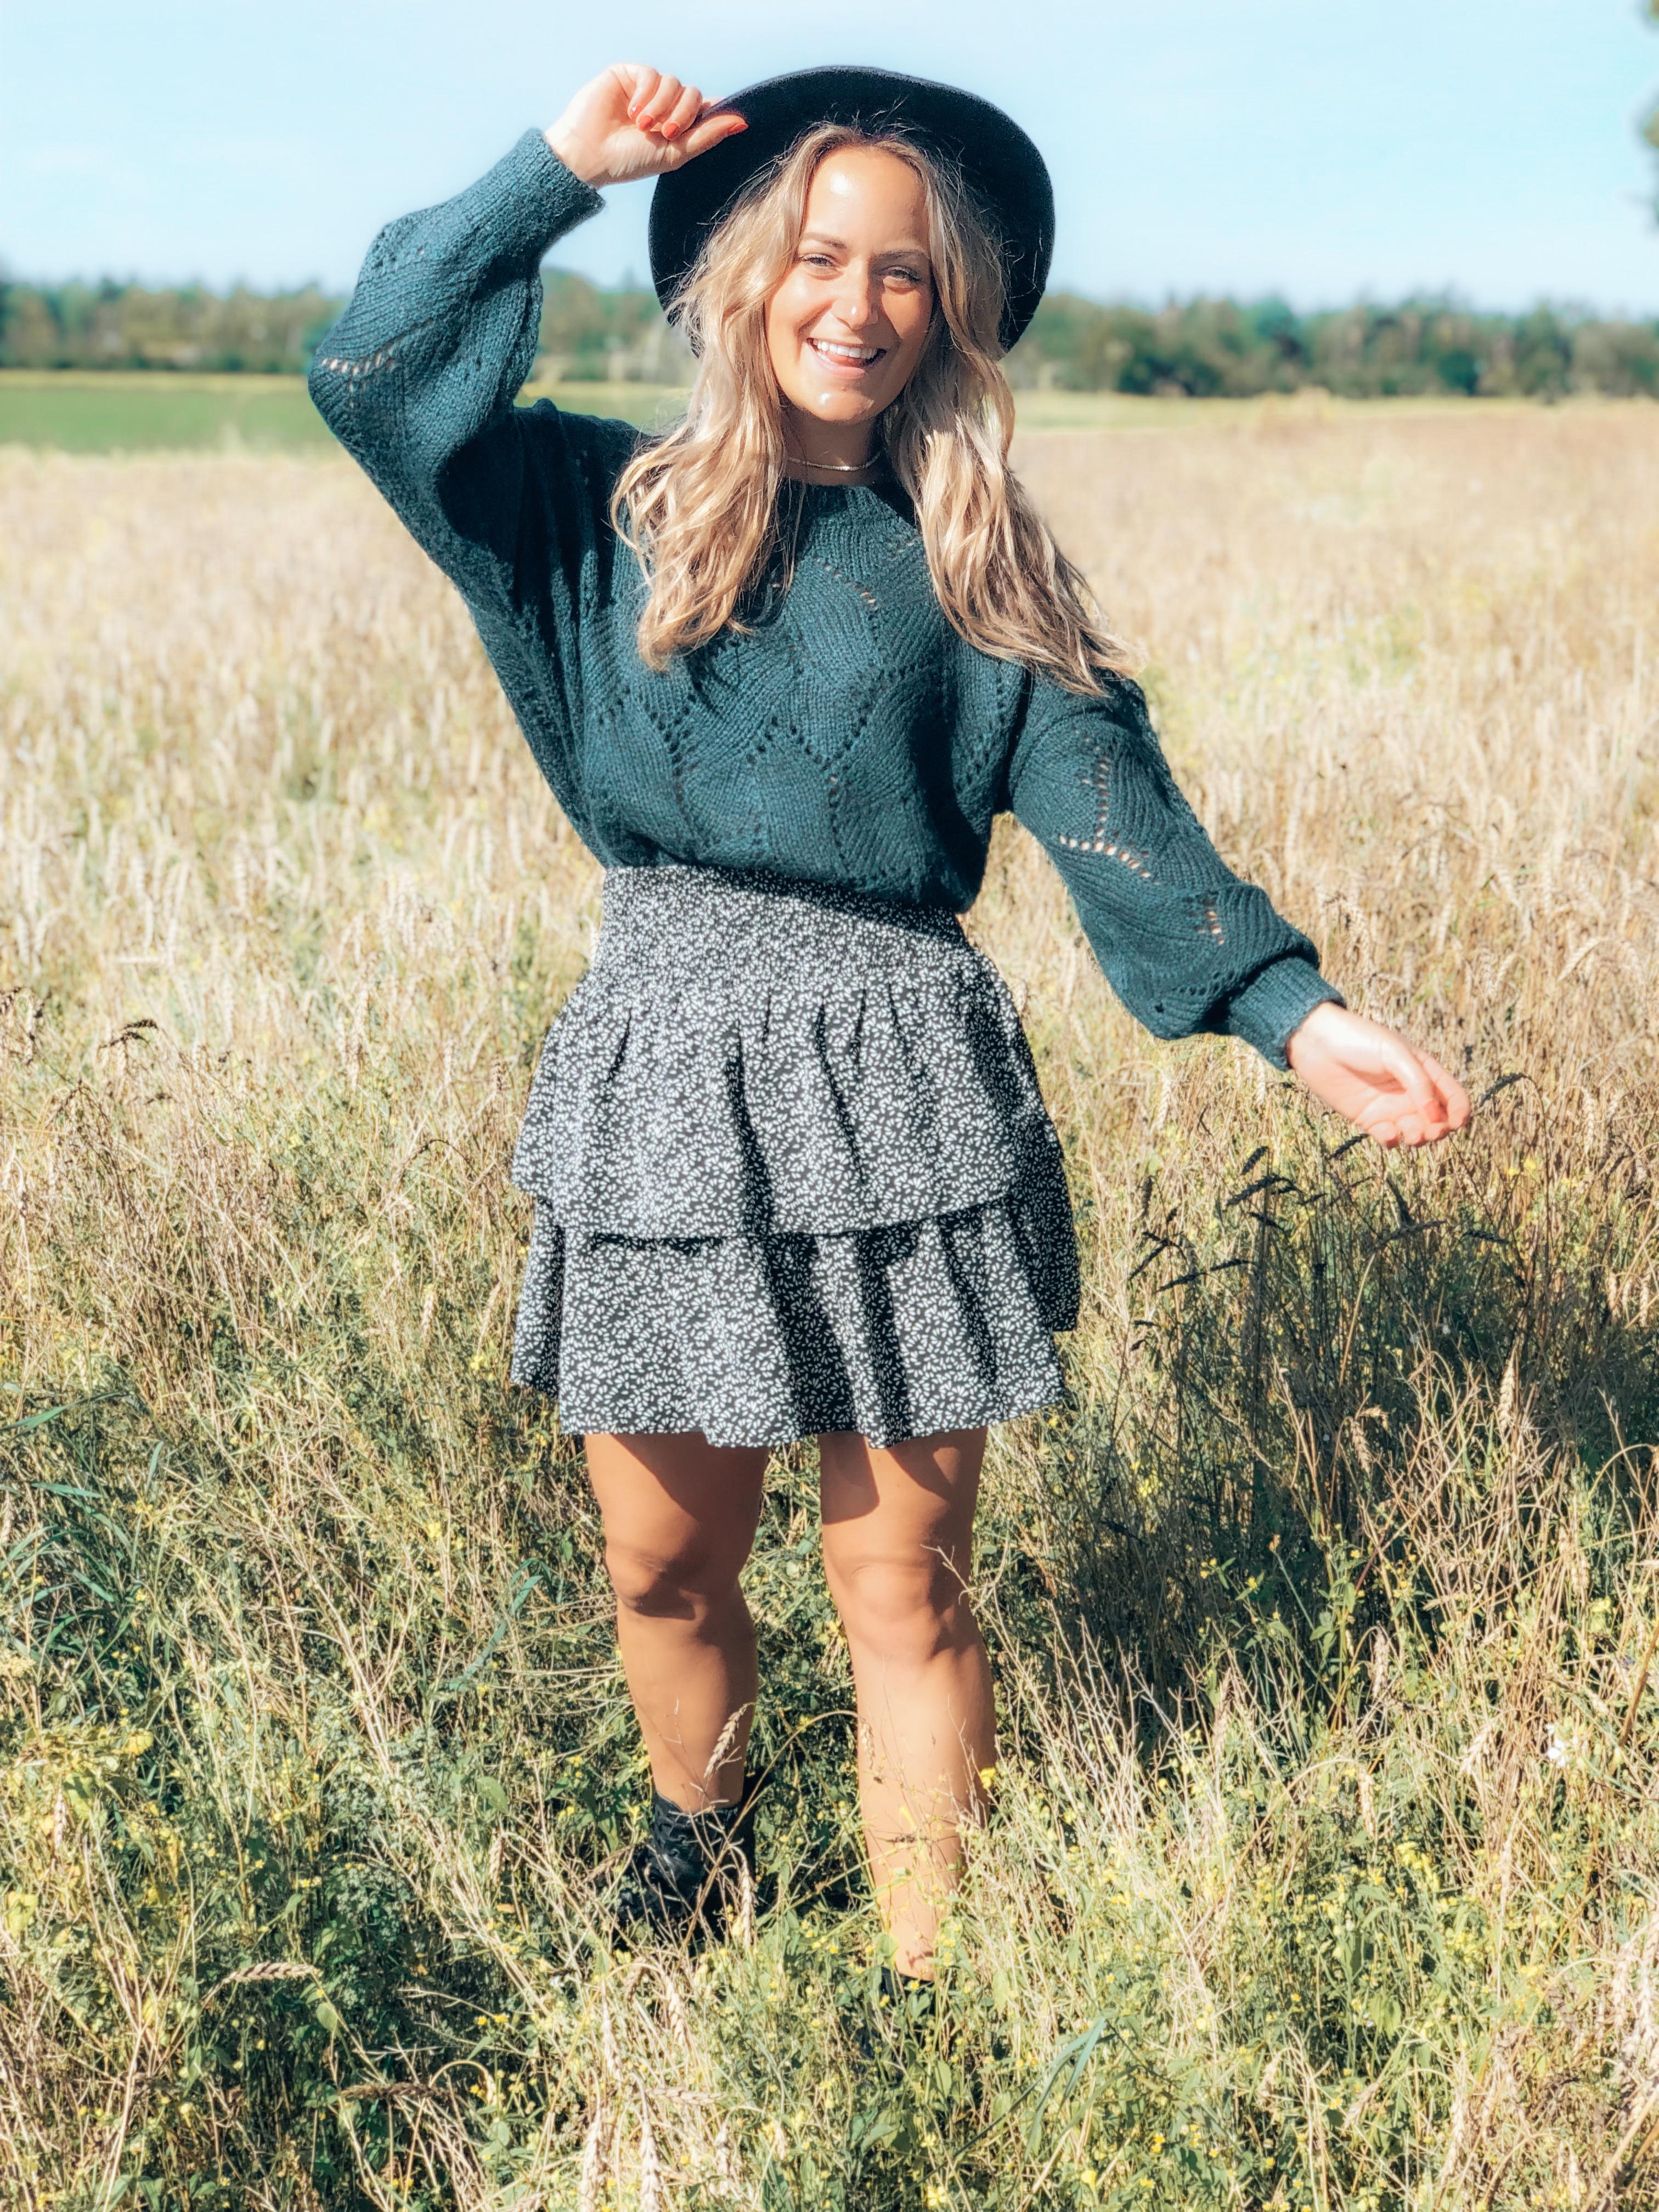 trui, knit, knitwear, sweater, rok, rokje, najaar, winter, outfit, roxz, roxz fashion, fashion, xmariekie